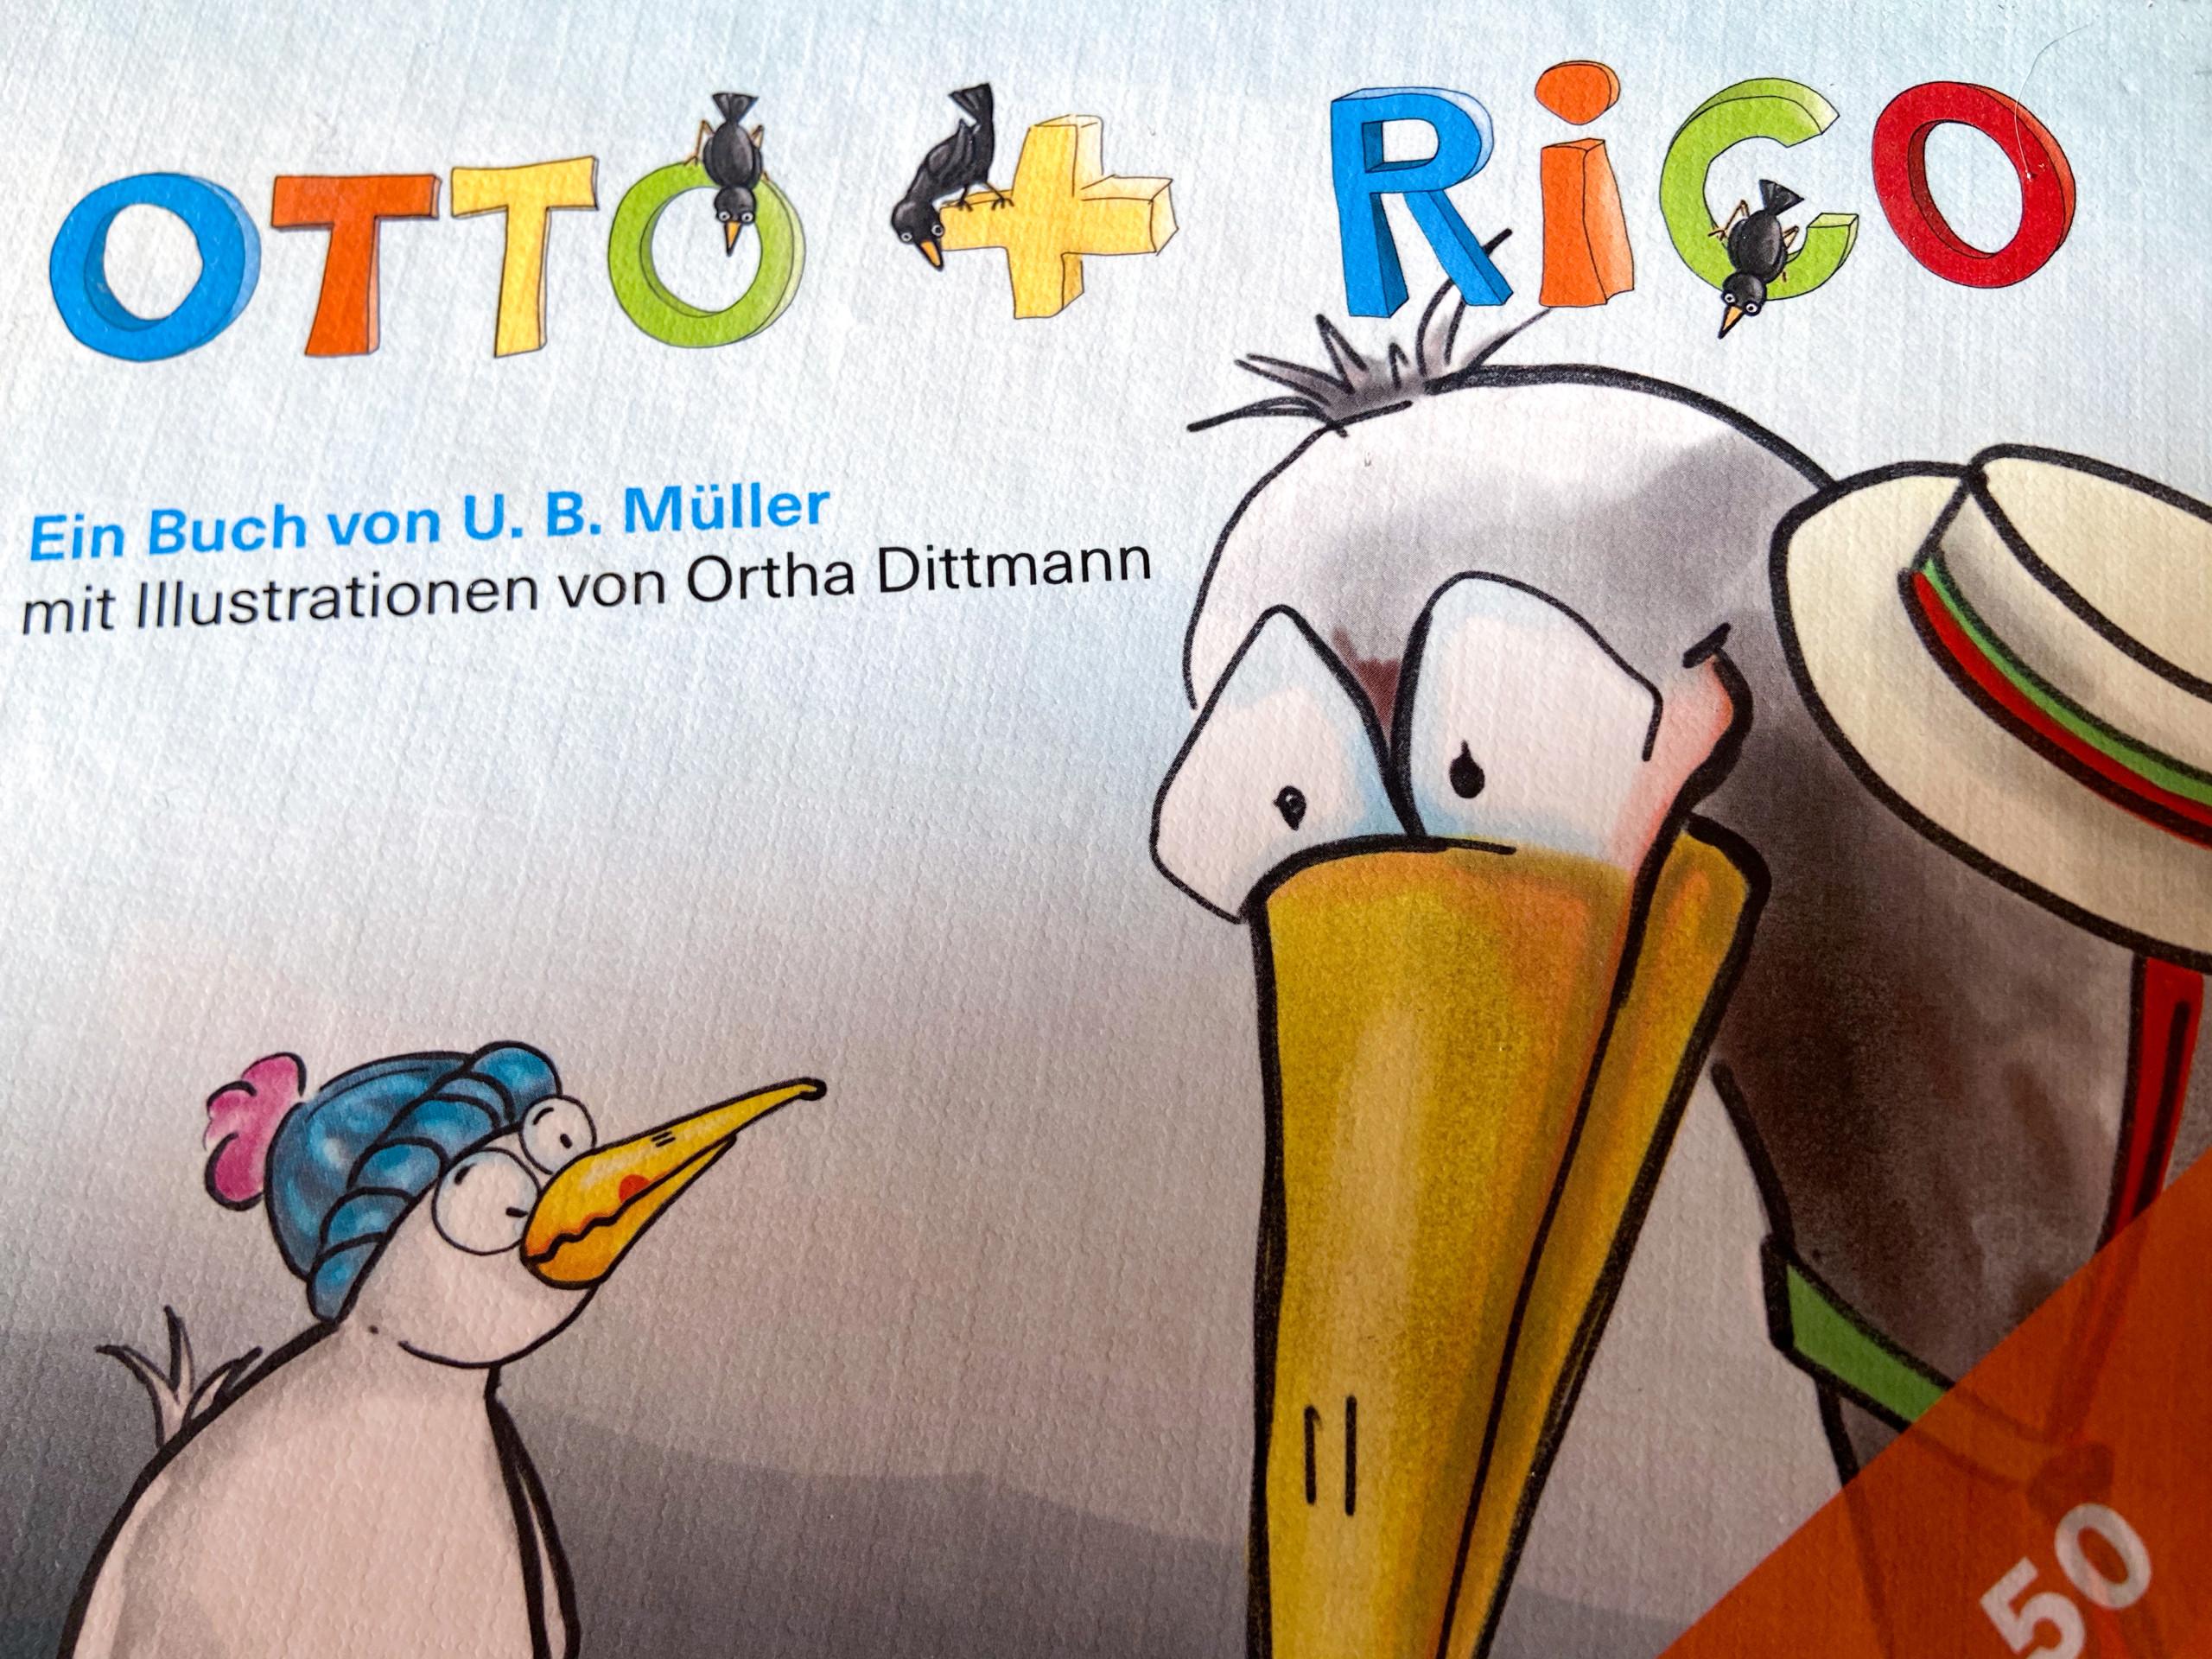 Otto umd Rico - Kinderbuch Cover